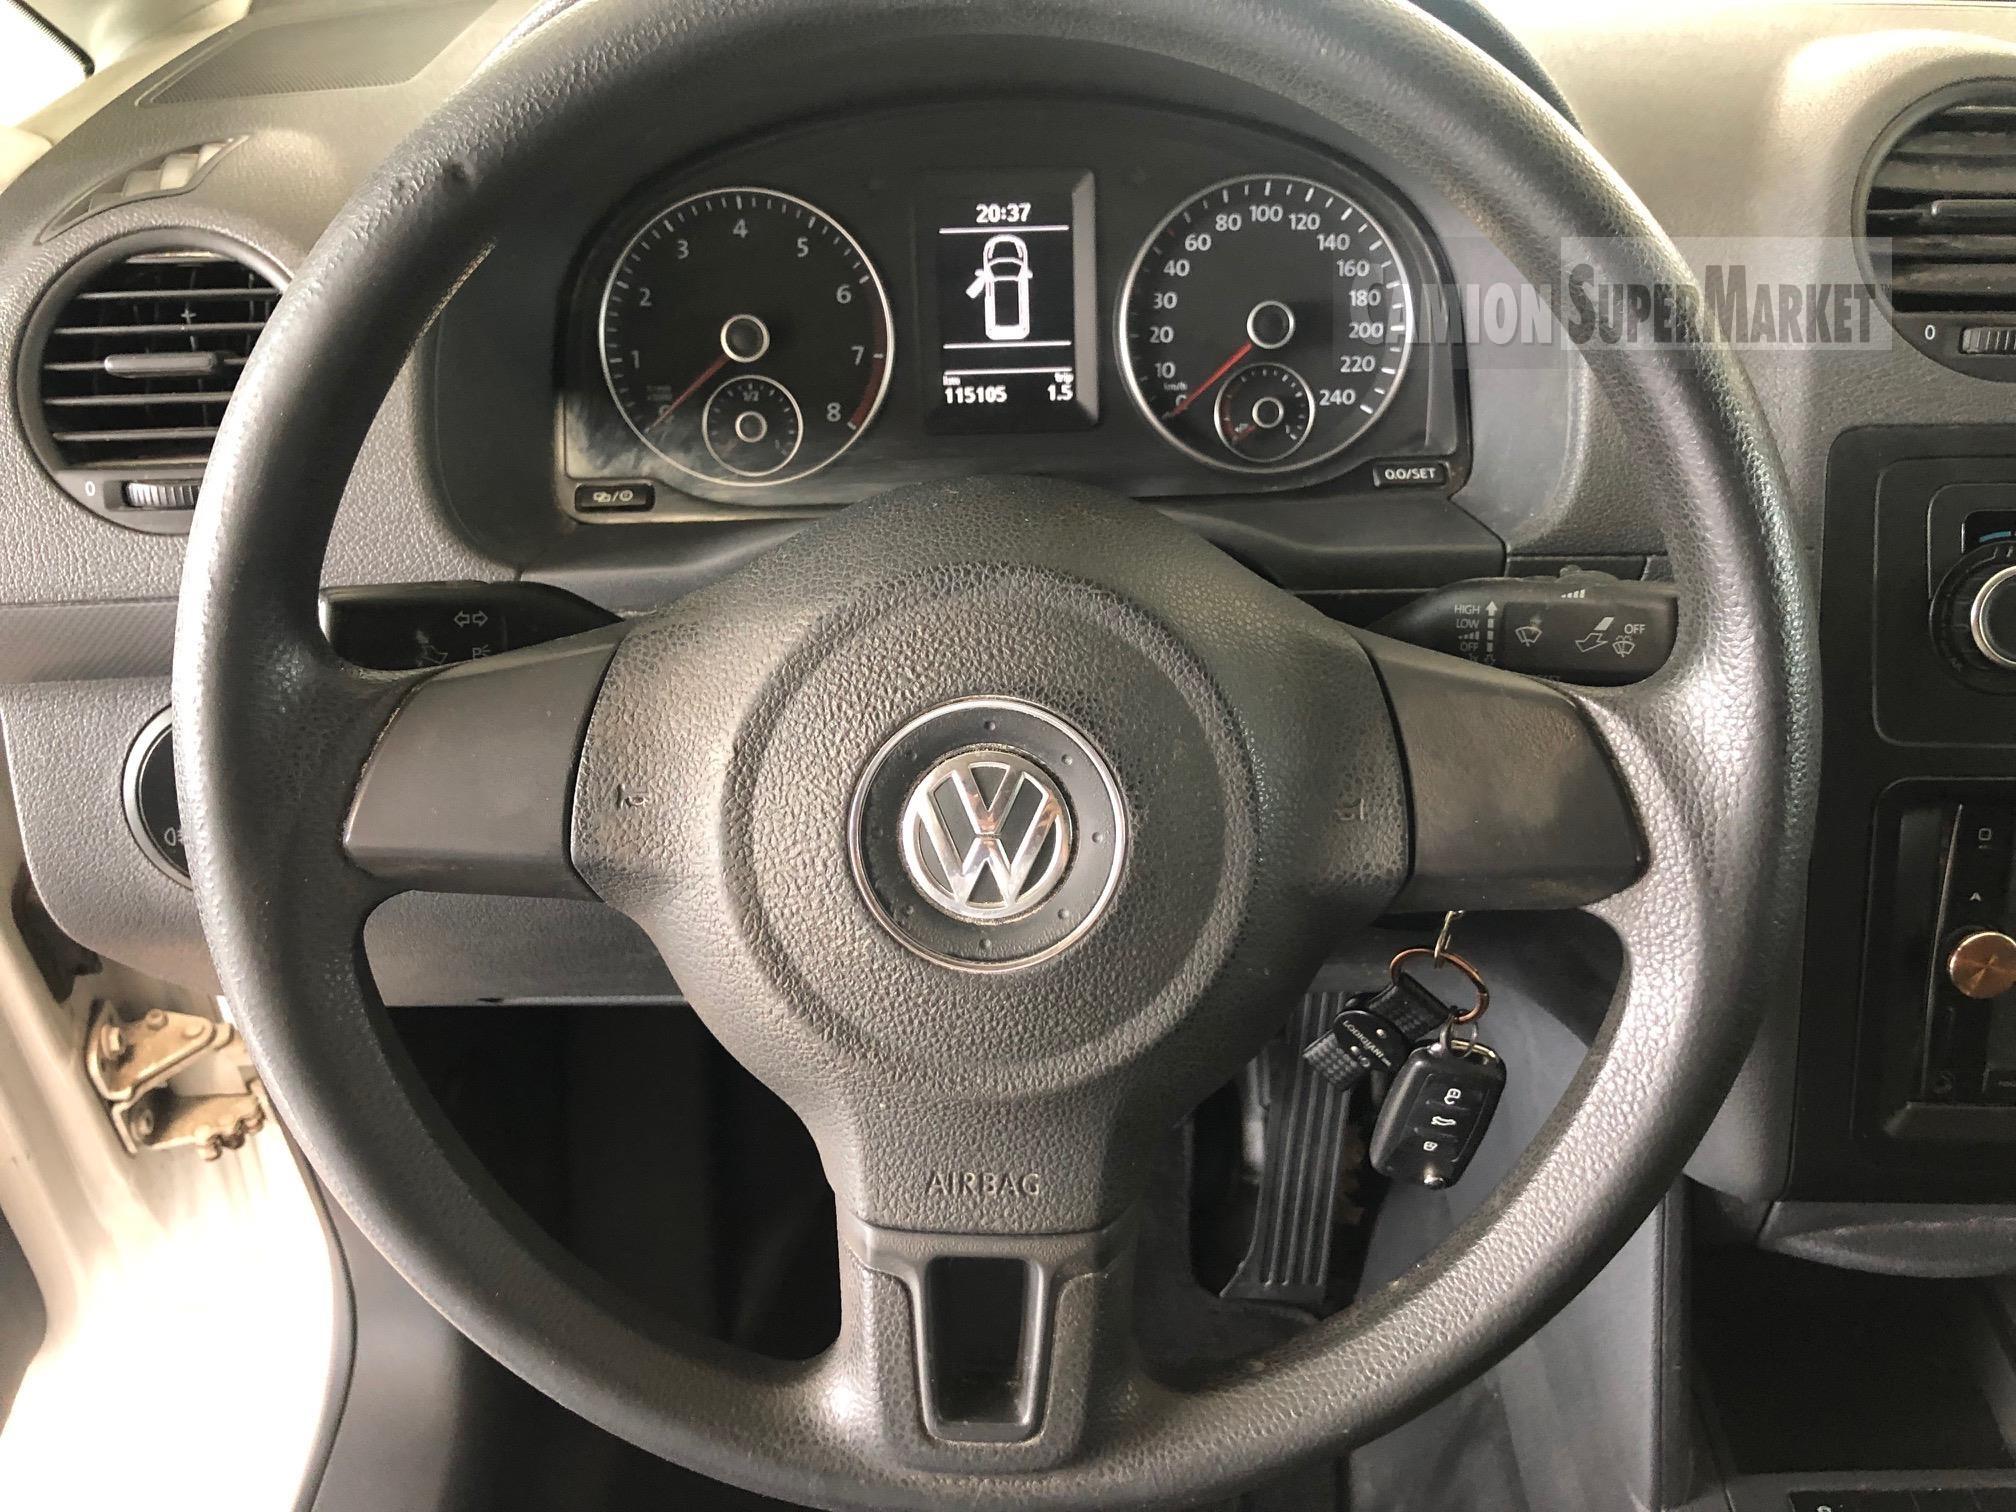 Volkswagen CADDY 2.0TDI Usato 2015 Lombardia